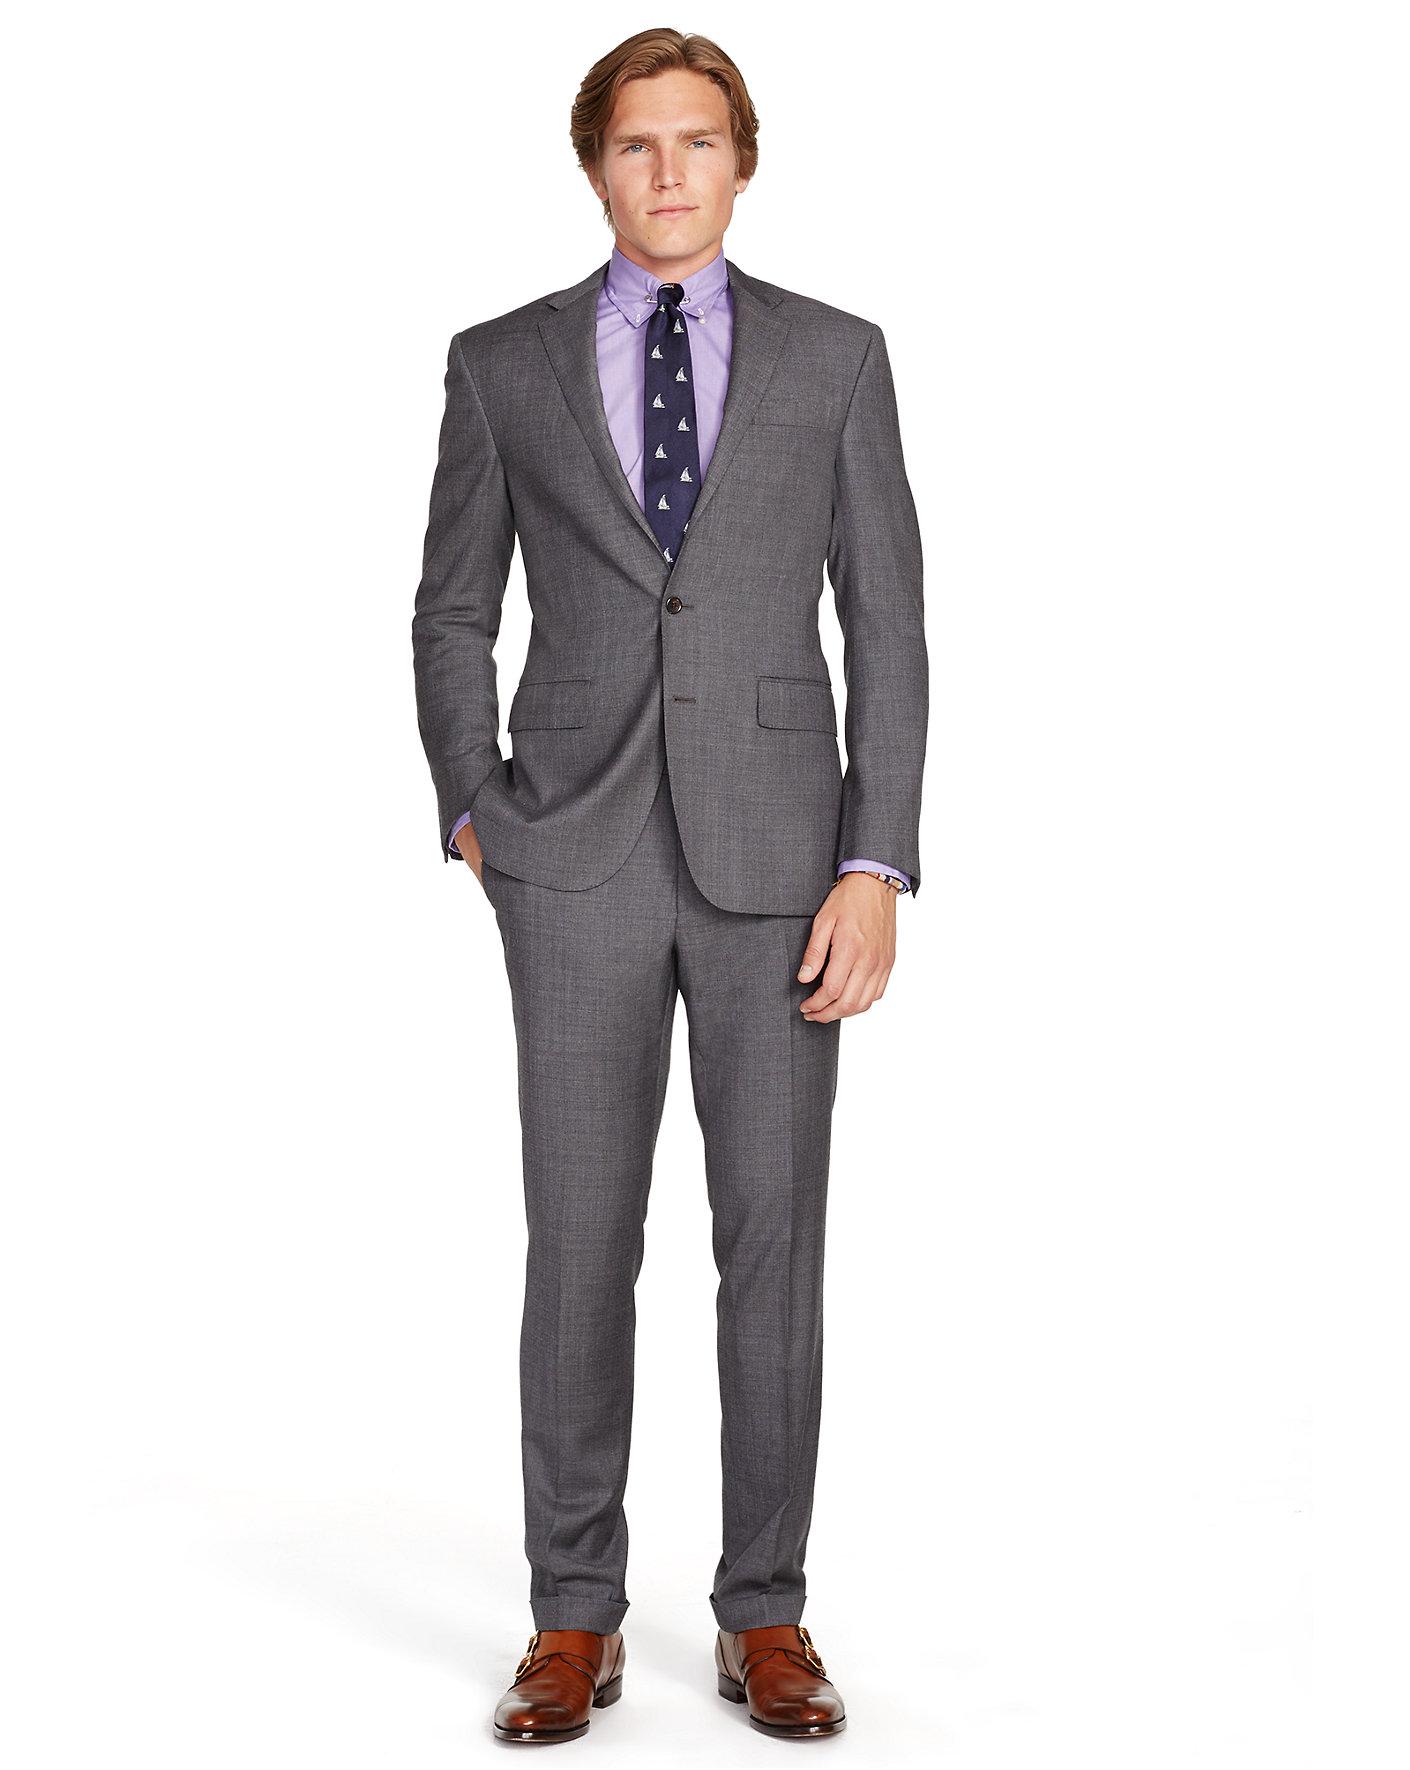 Ralph Lauren Latest Mens Fashion Suits Party Wear Formal Dresses Collection 2014-2015 (4)